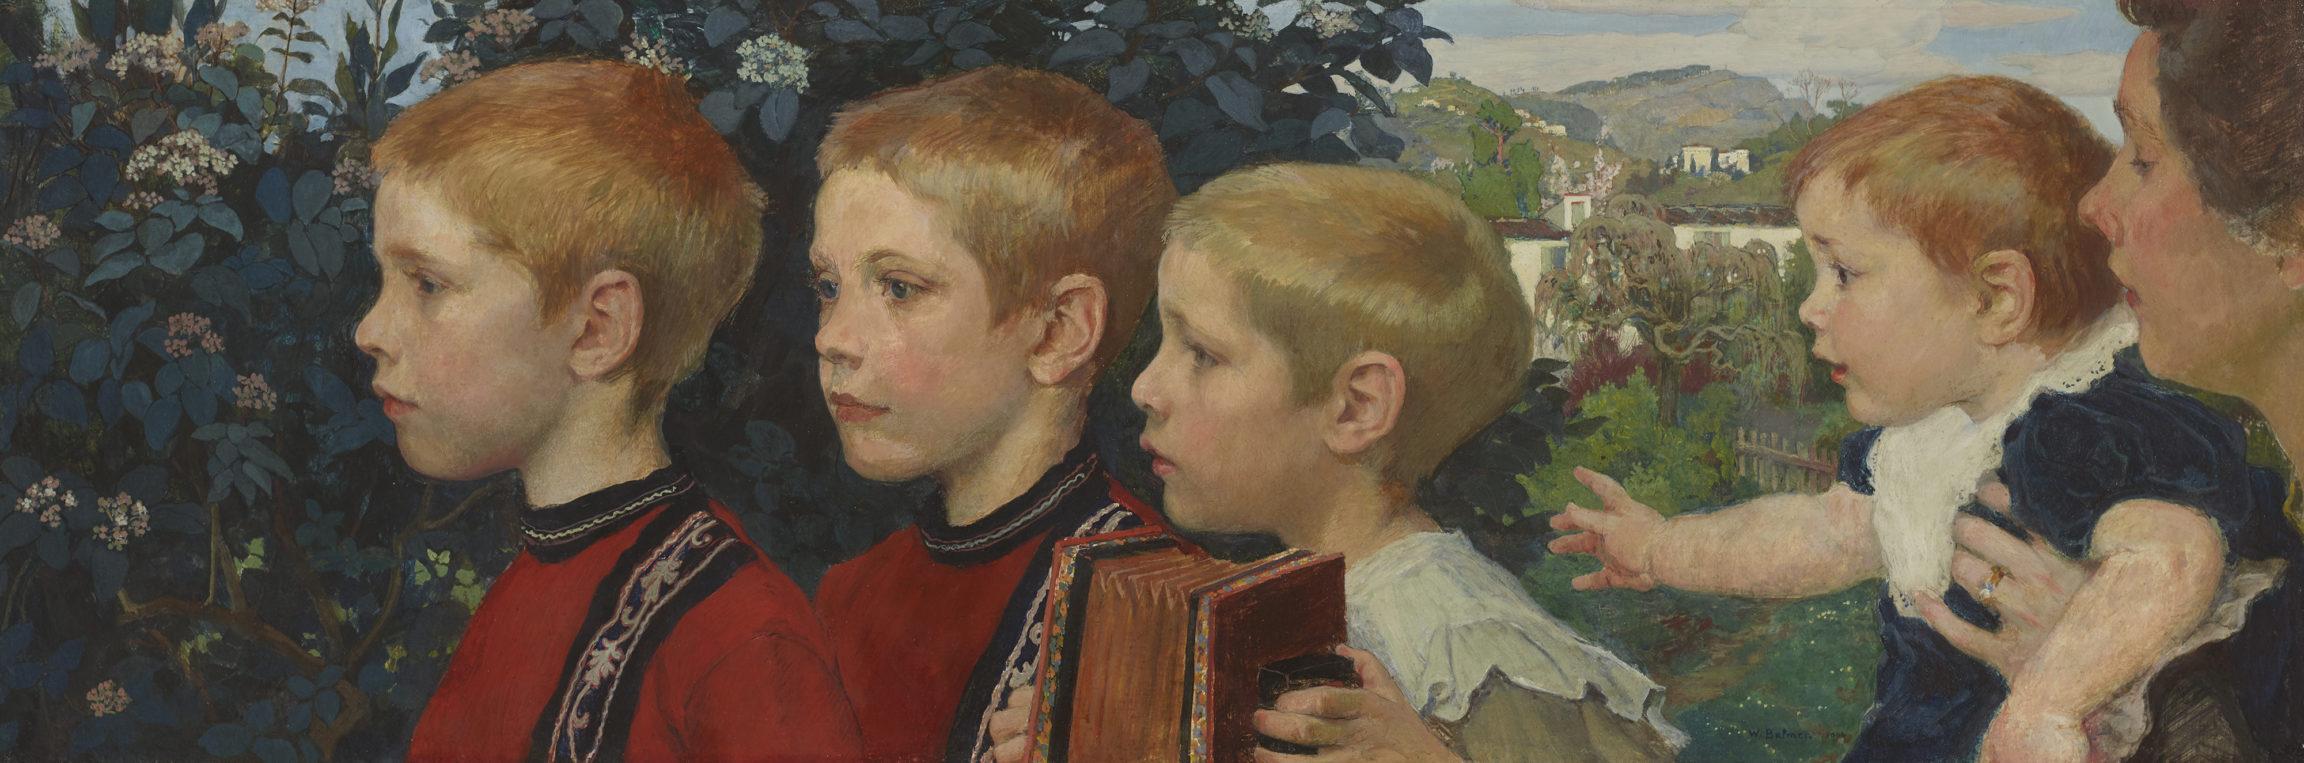 Paul Friedrich Wilhelm Balmer , Quatre frères, 1903 / 1904